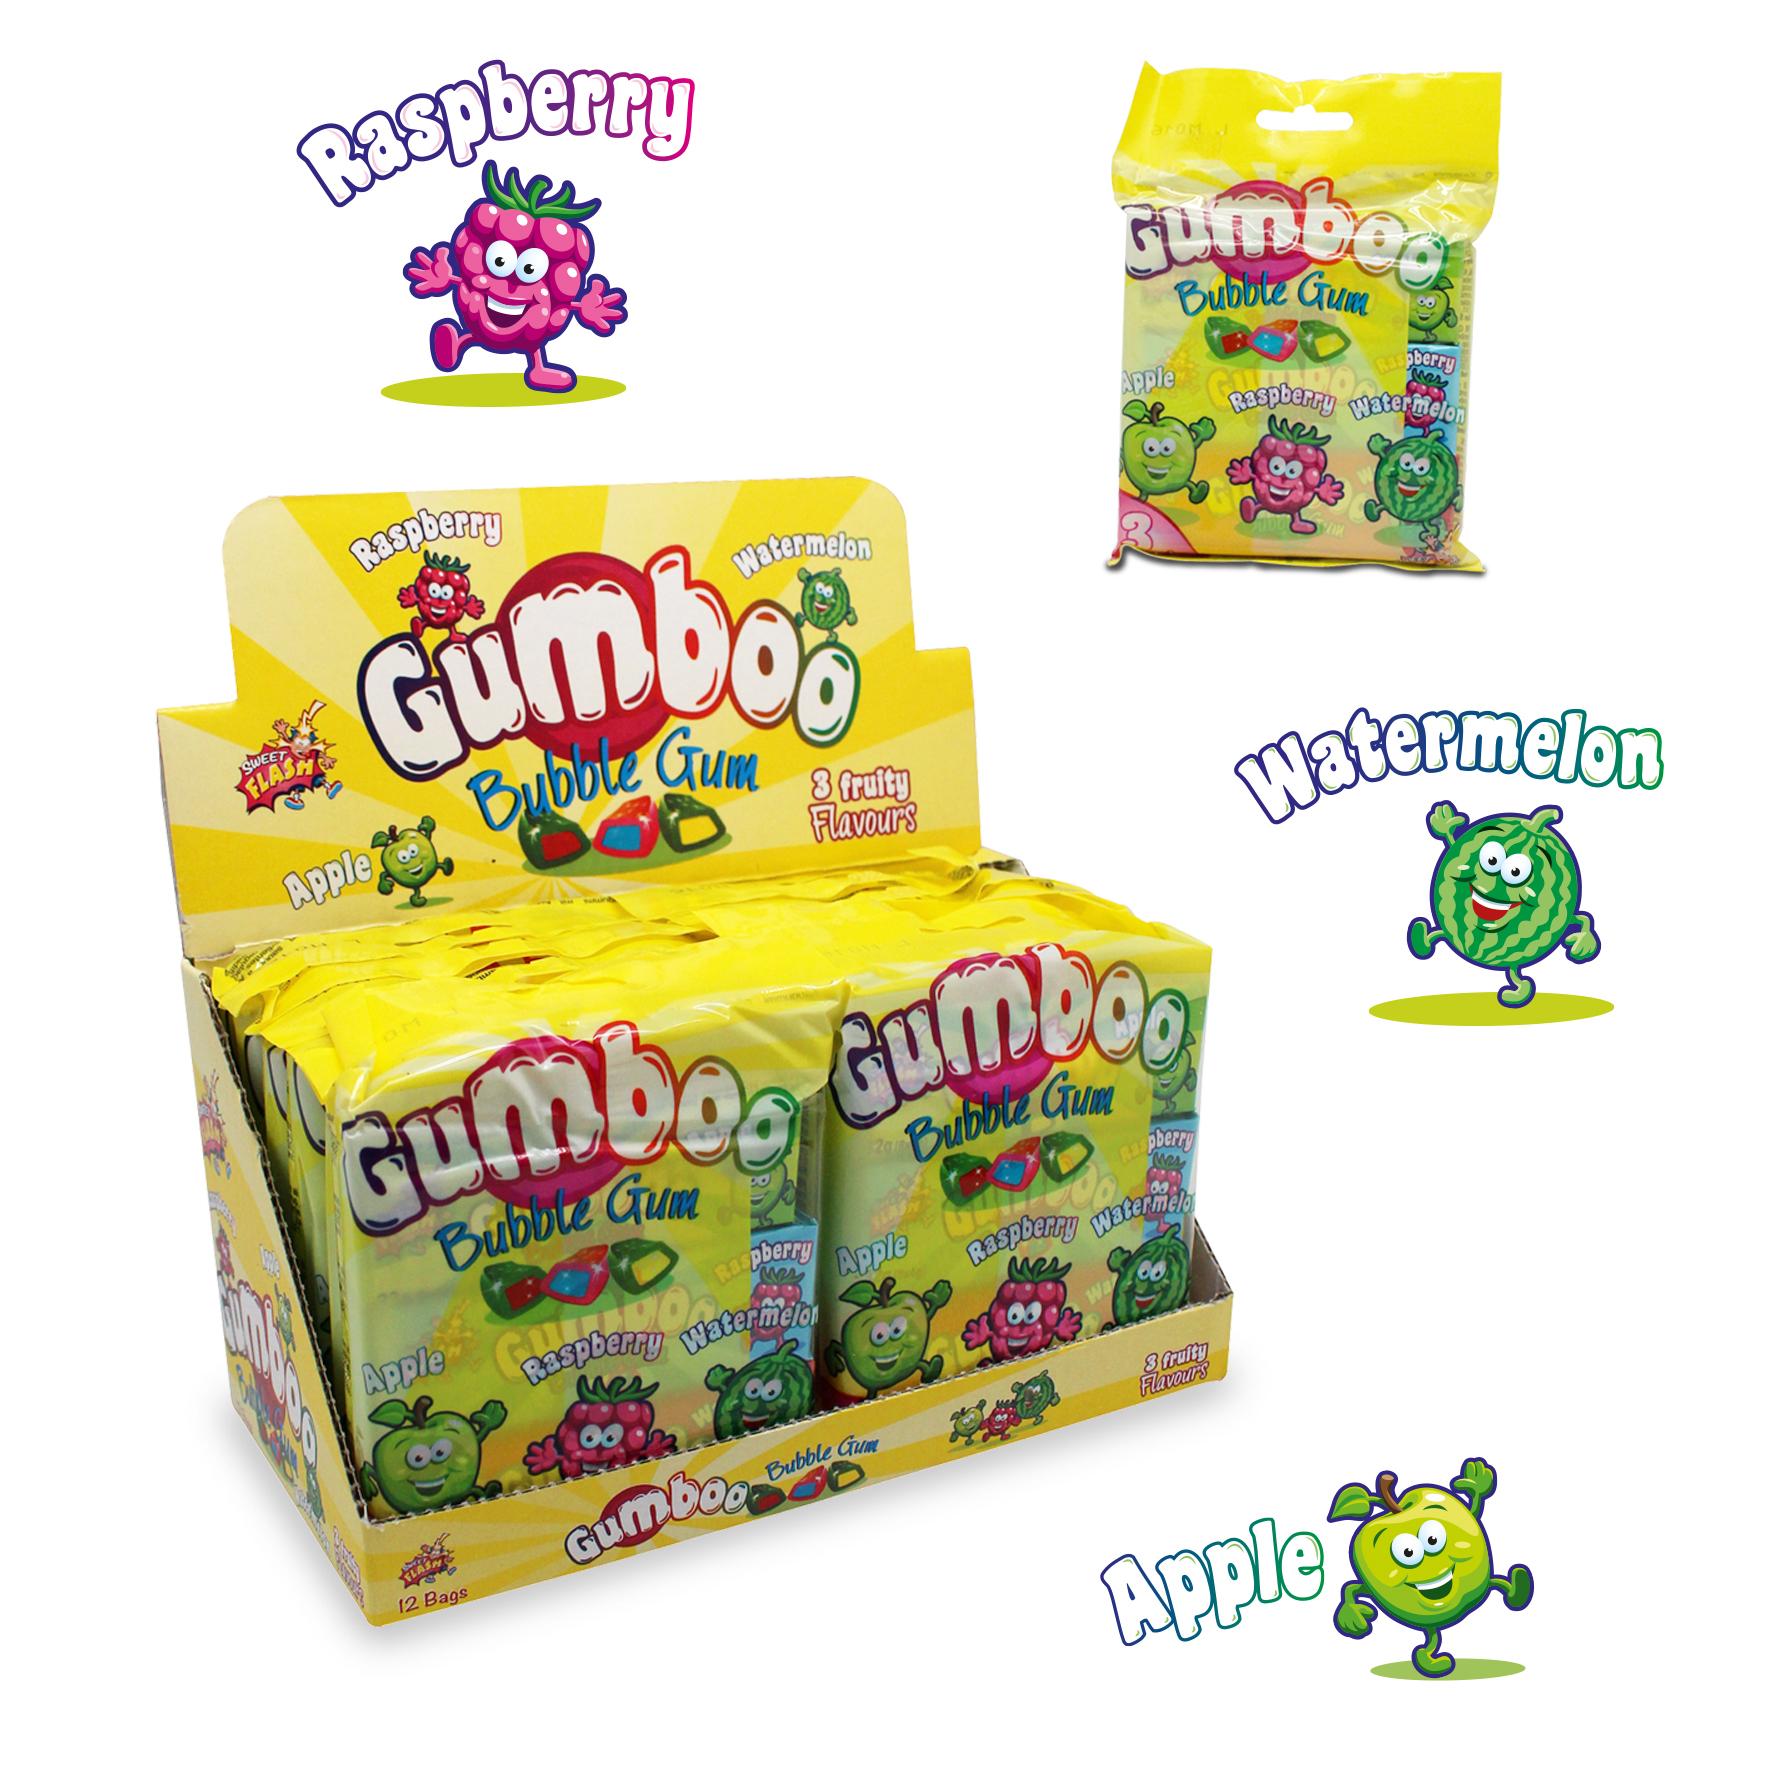 Gumboo's